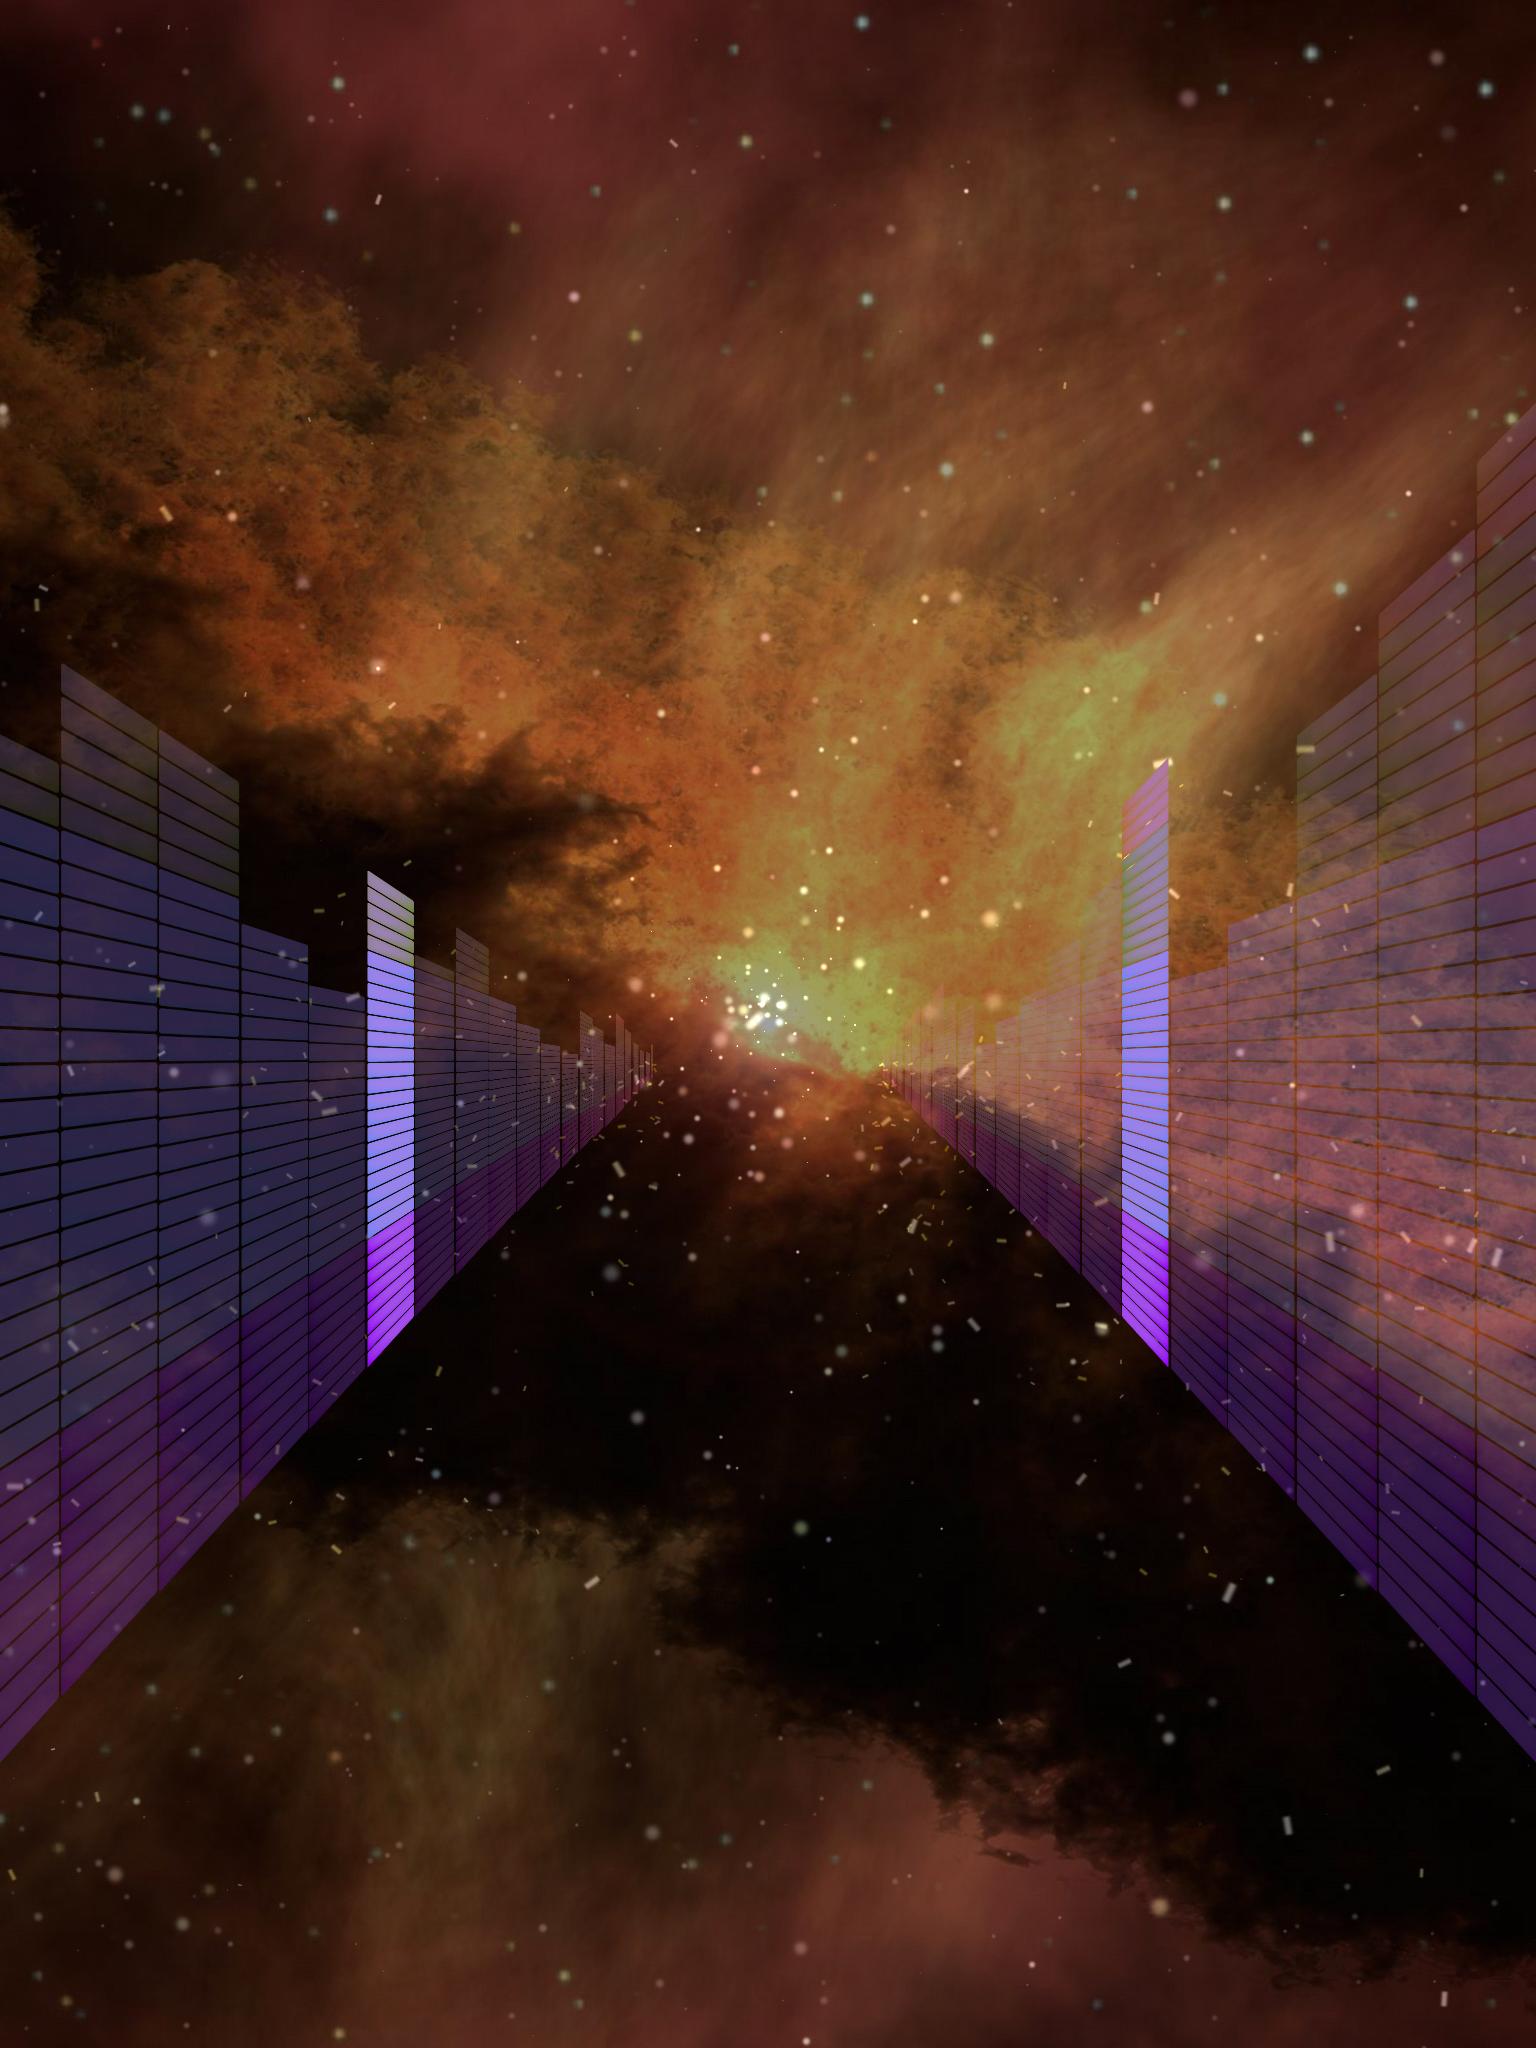 http://www.ict-fractal.com/blog/mzl.nsyinxuv.png